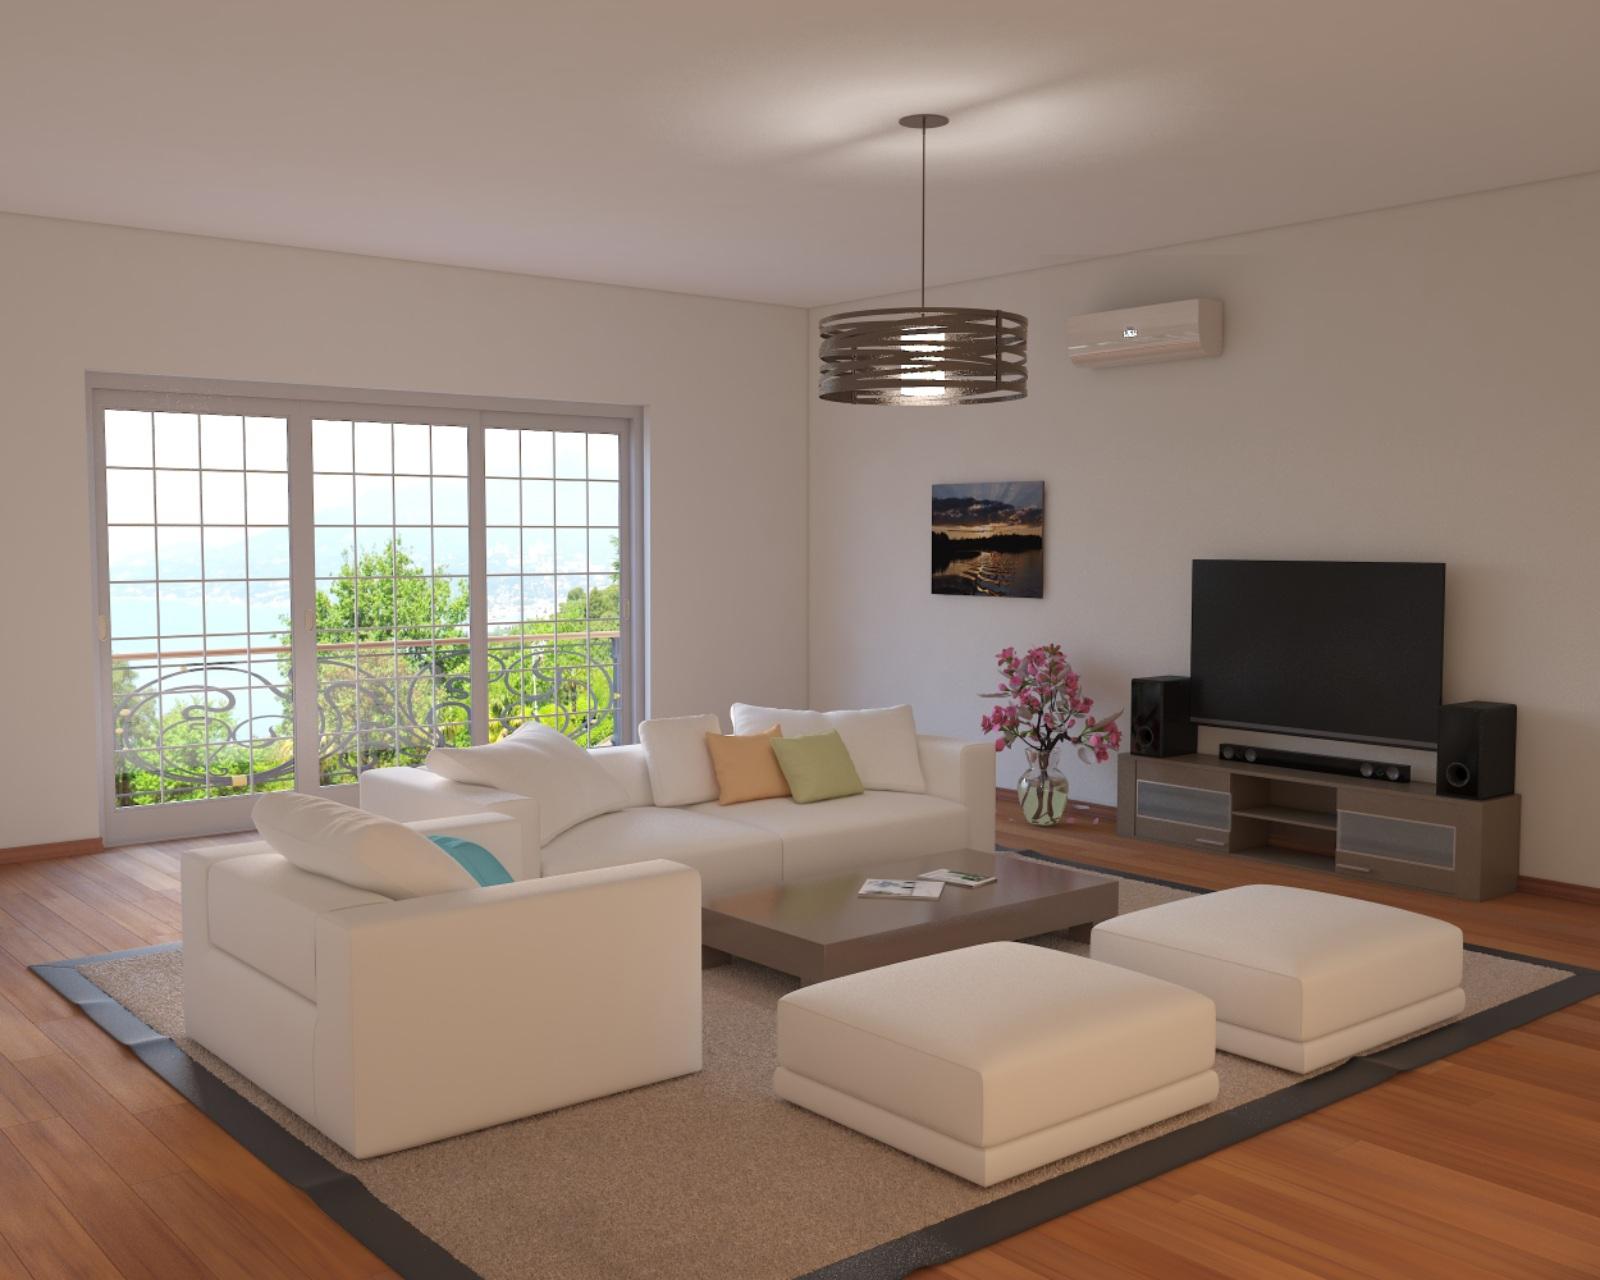 Разработка дизайна интерьера комнаты фото f_1475a259a59bd881.jpg